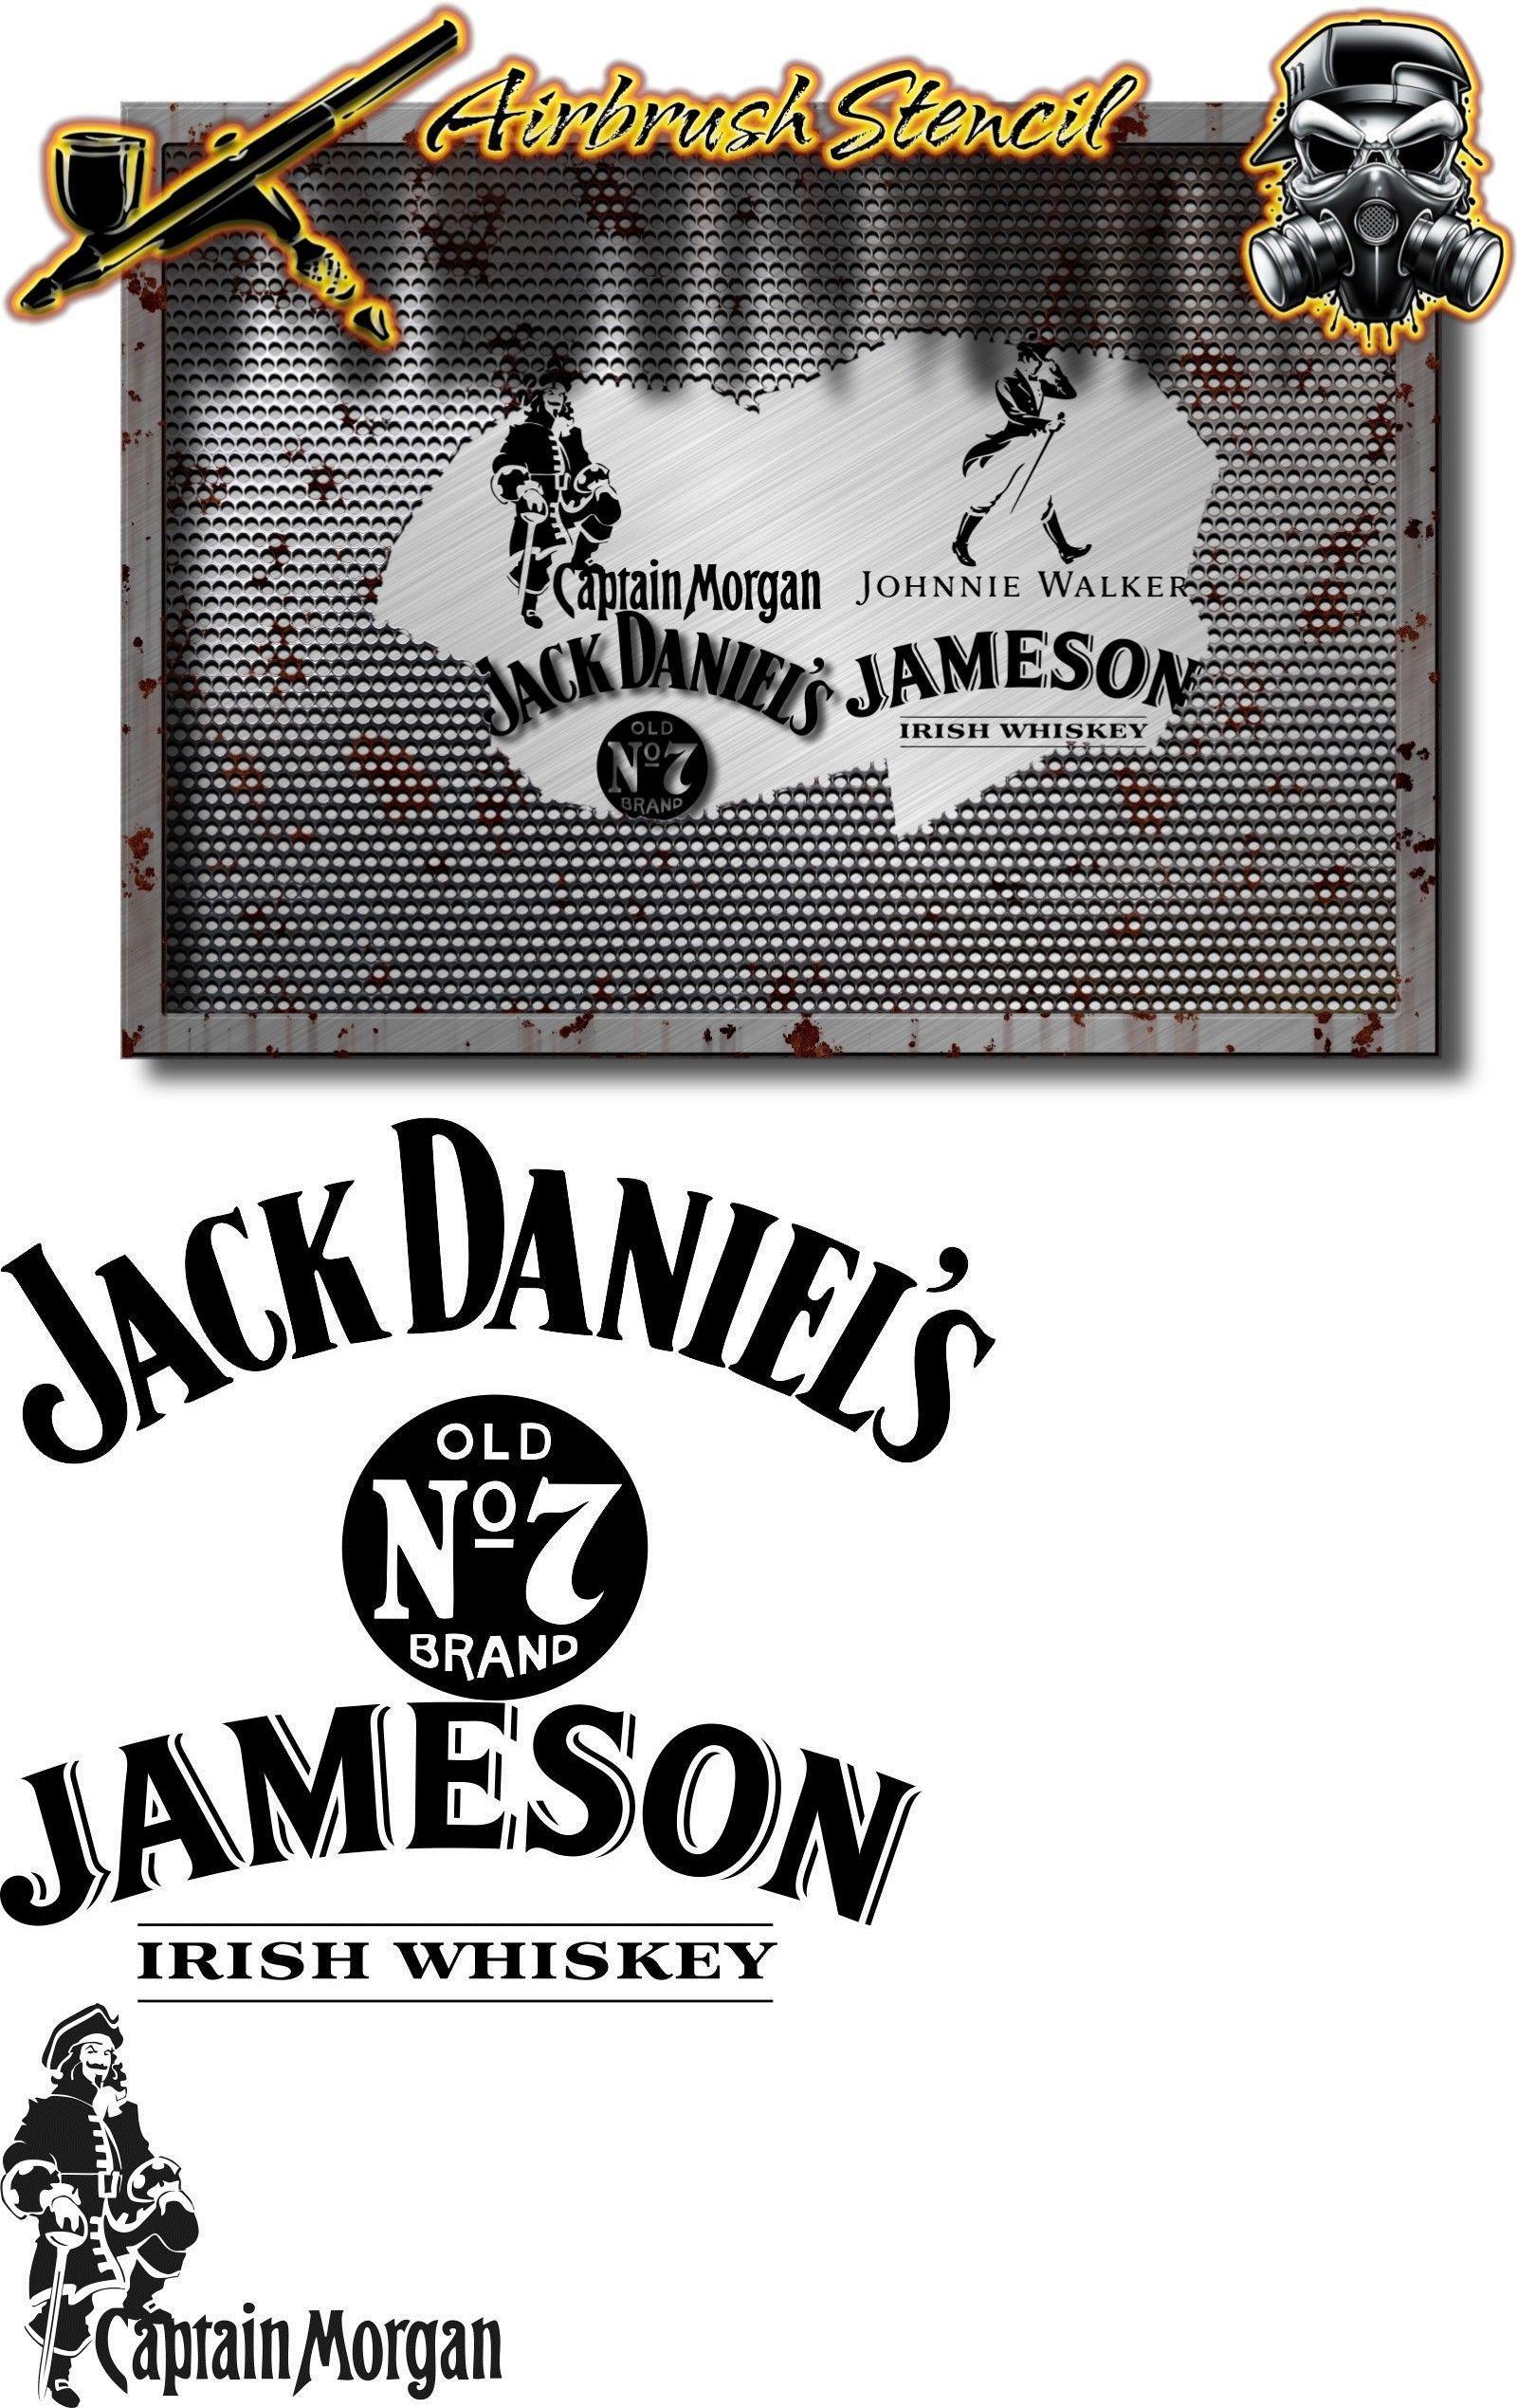 Stencils and Templates 183185: Jack Daniels, Jameson, Captain Morgan ...